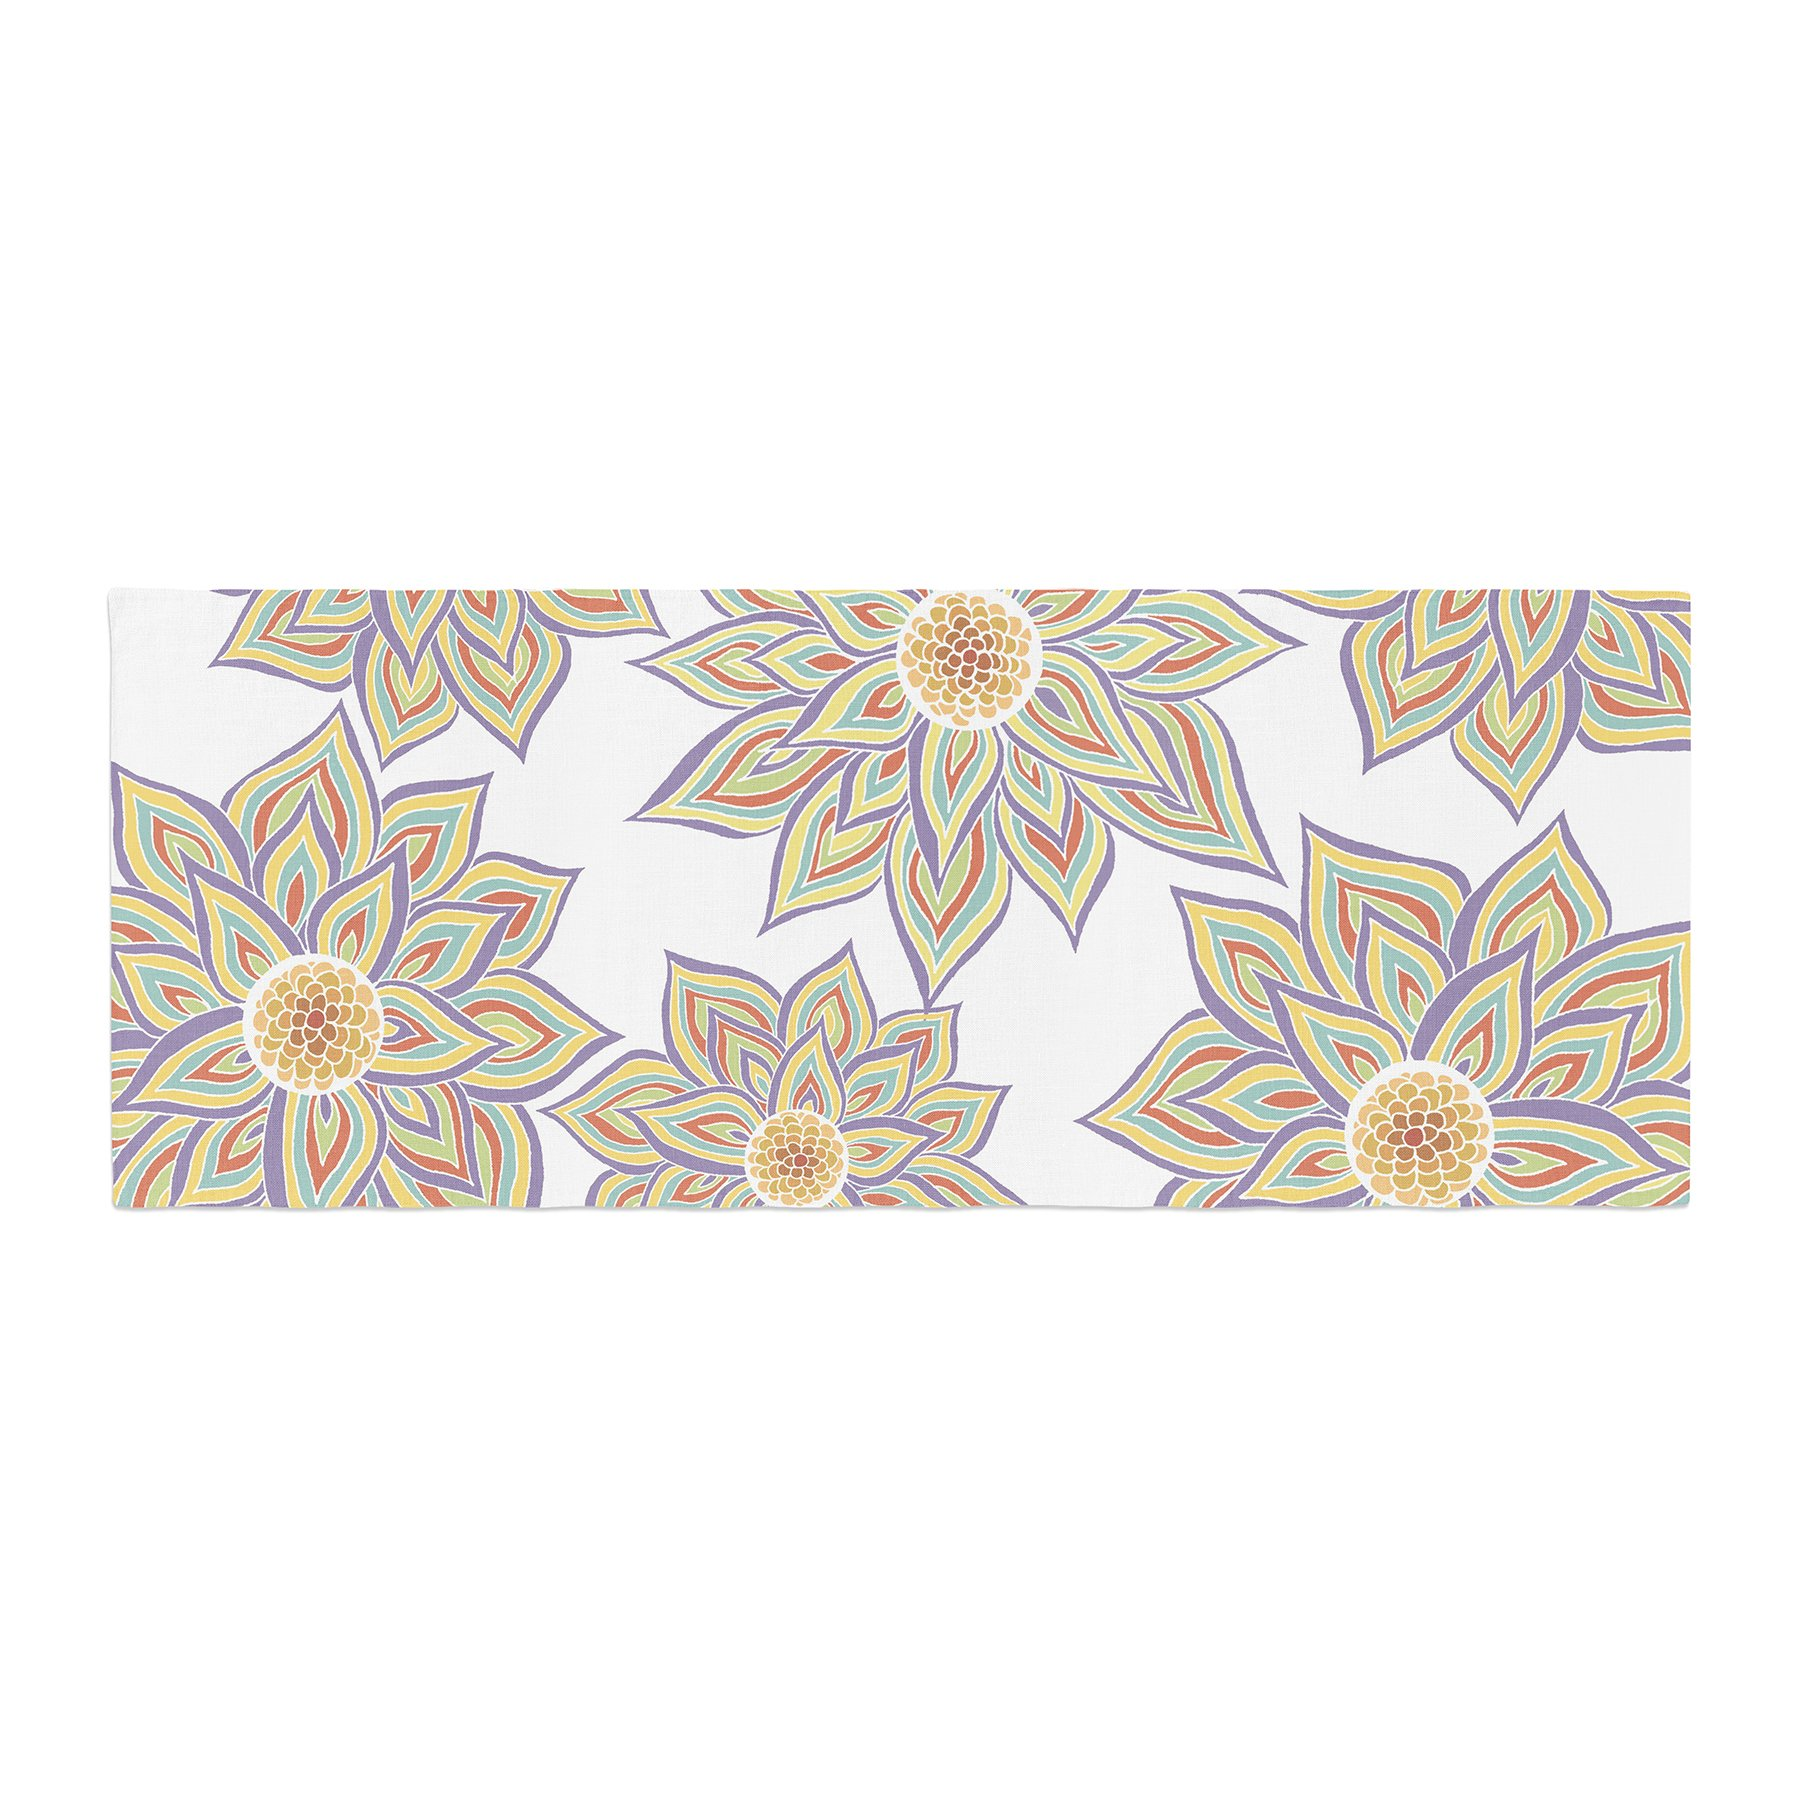 Kess InHouse Pom Graphic Design Floral Dance Bed Runner, 34'' x 86''